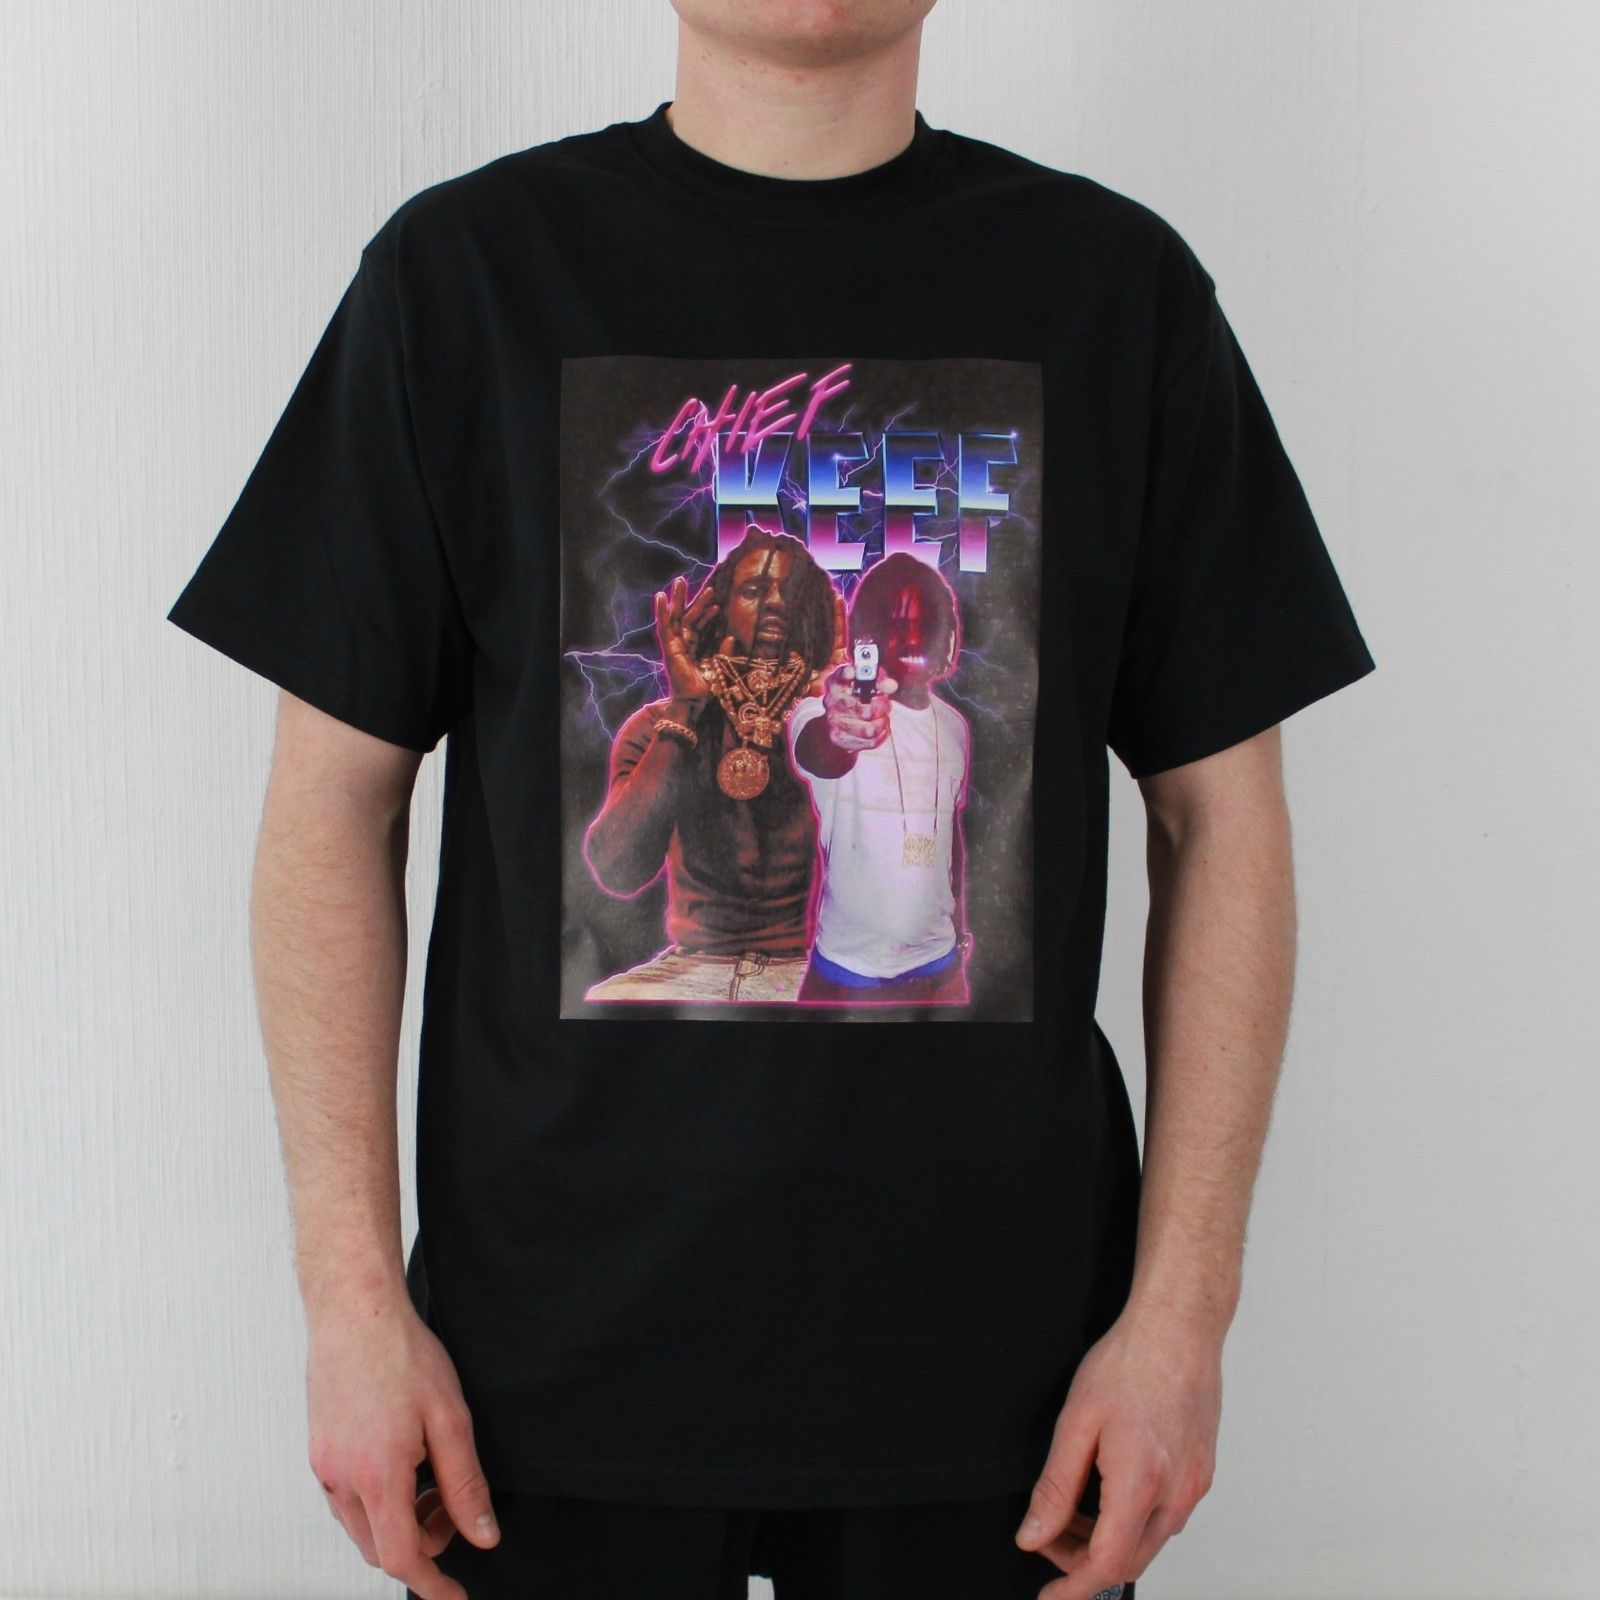 Chief Keef Sosa Purple Reign camiseta negra Trap Hip Hop Vintage cómoda camiseta pantalón corto Casual manga estampado camiseta